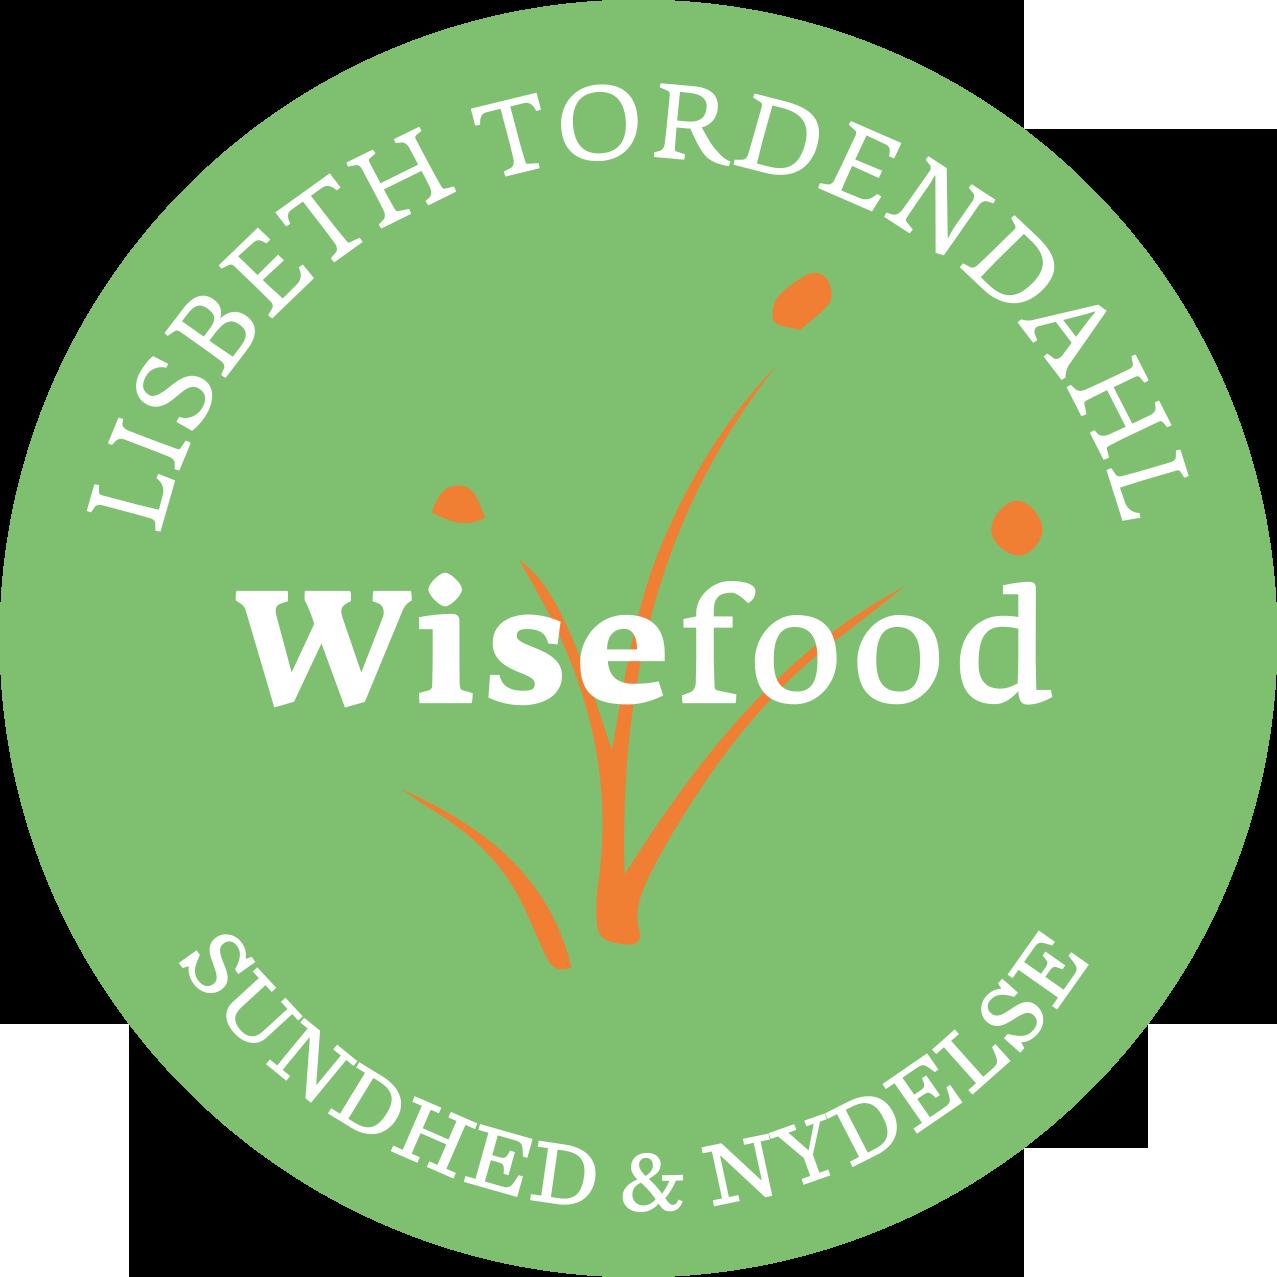 Lisbeth Tordendahl Wisefood